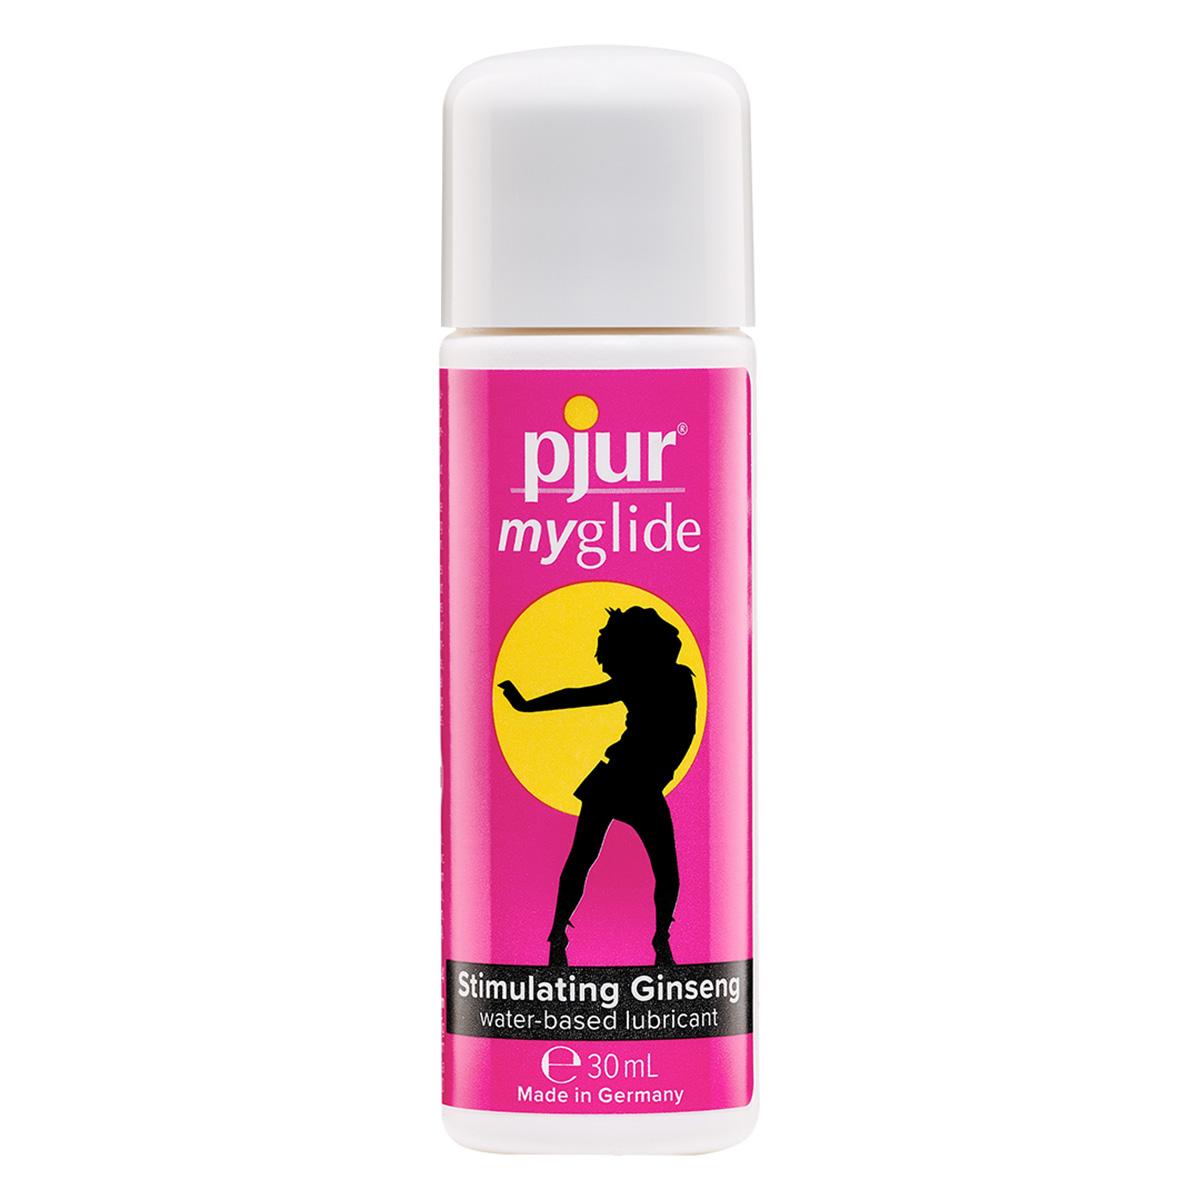 Стимулятор-лубрикант женский pjur® myglide 30 ml